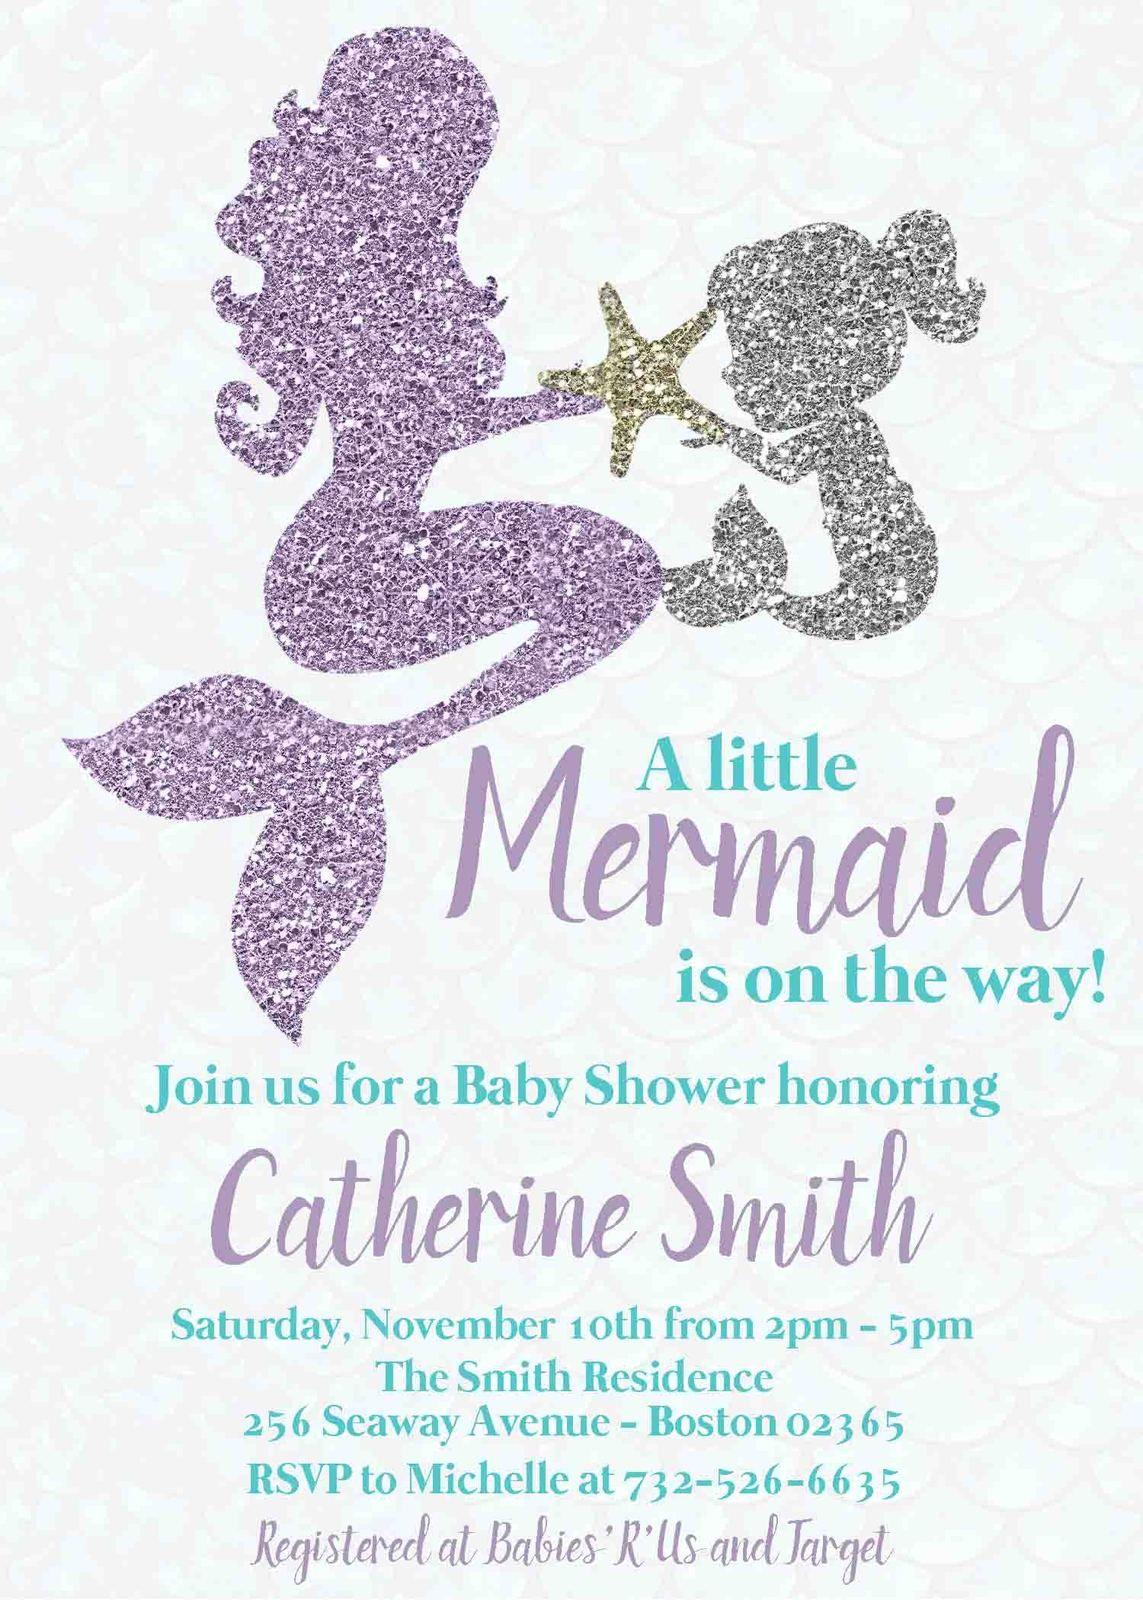 Teal and Lavender Glitter Mermaid.